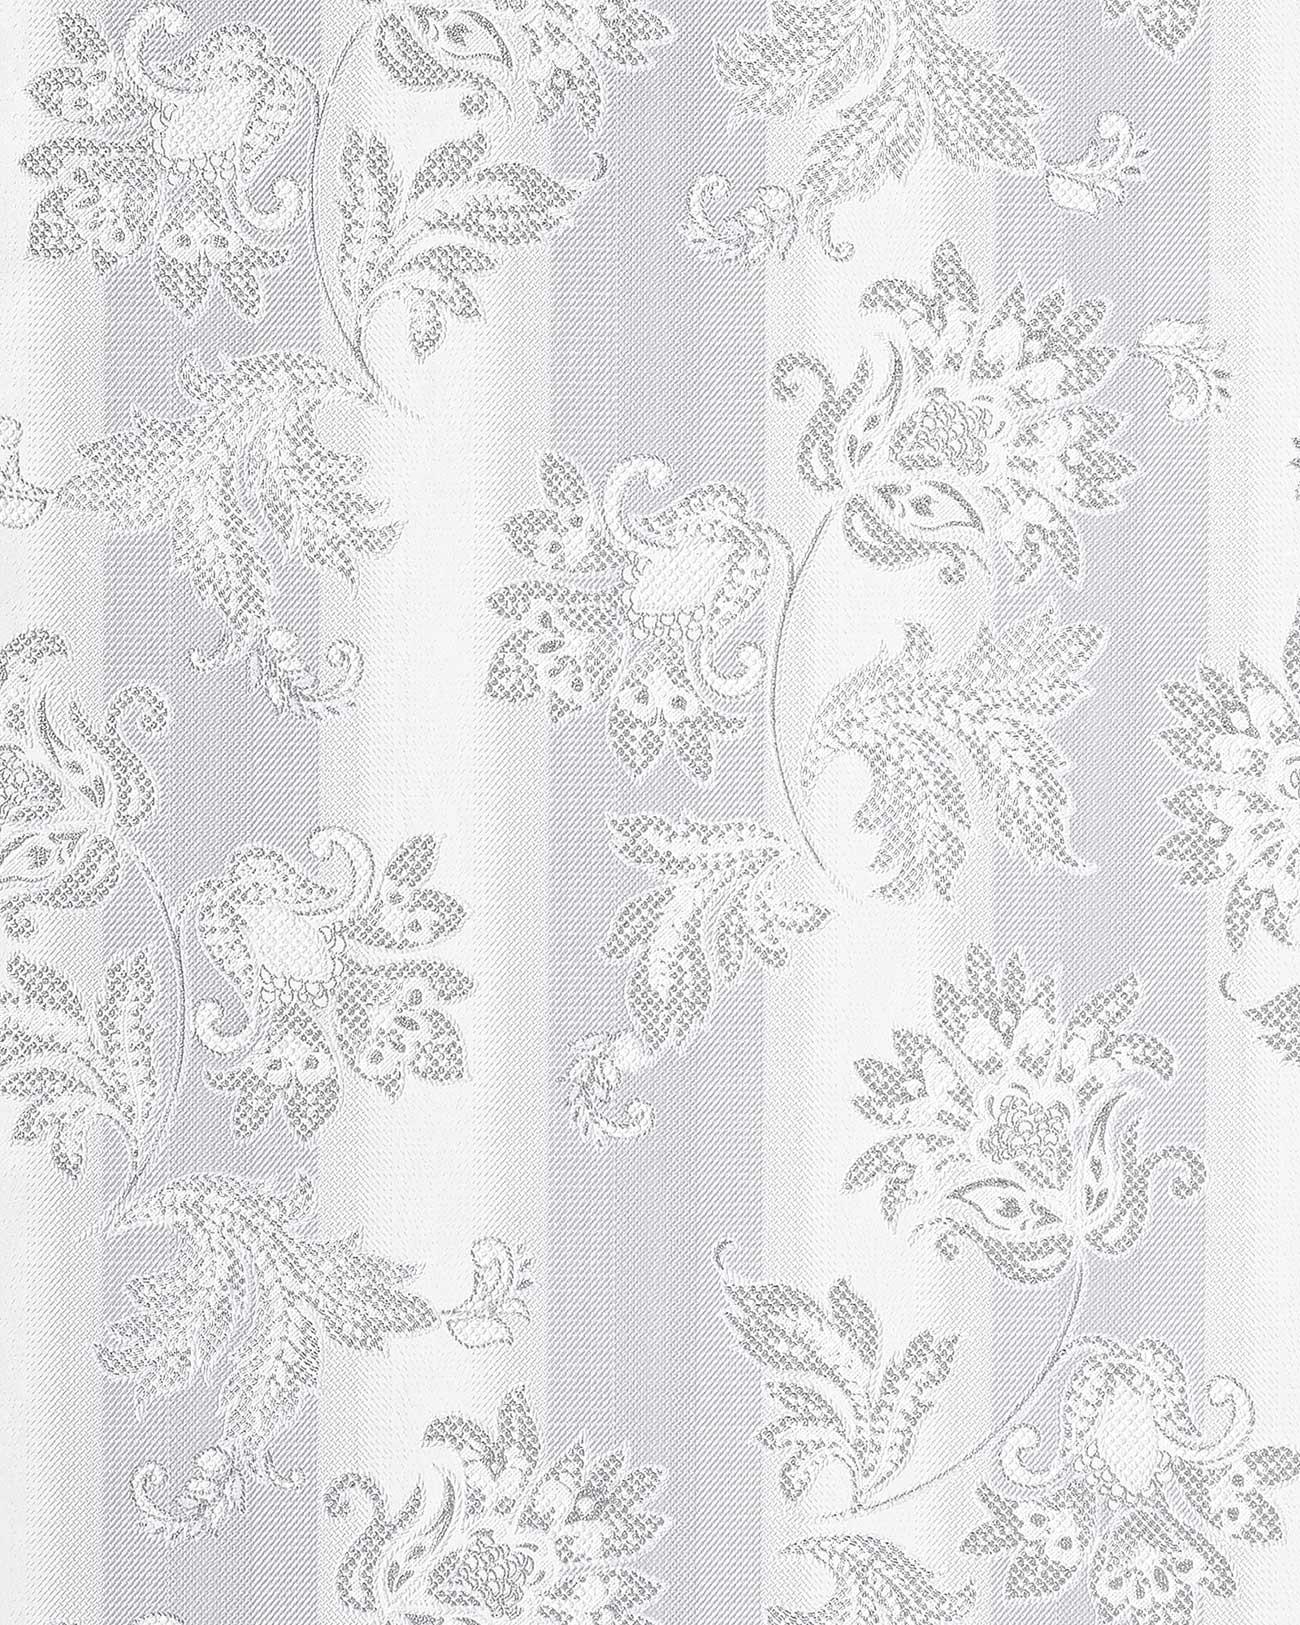 papier peint en vinyle design motif floral edem 084 20. Black Bedroom Furniture Sets. Home Design Ideas